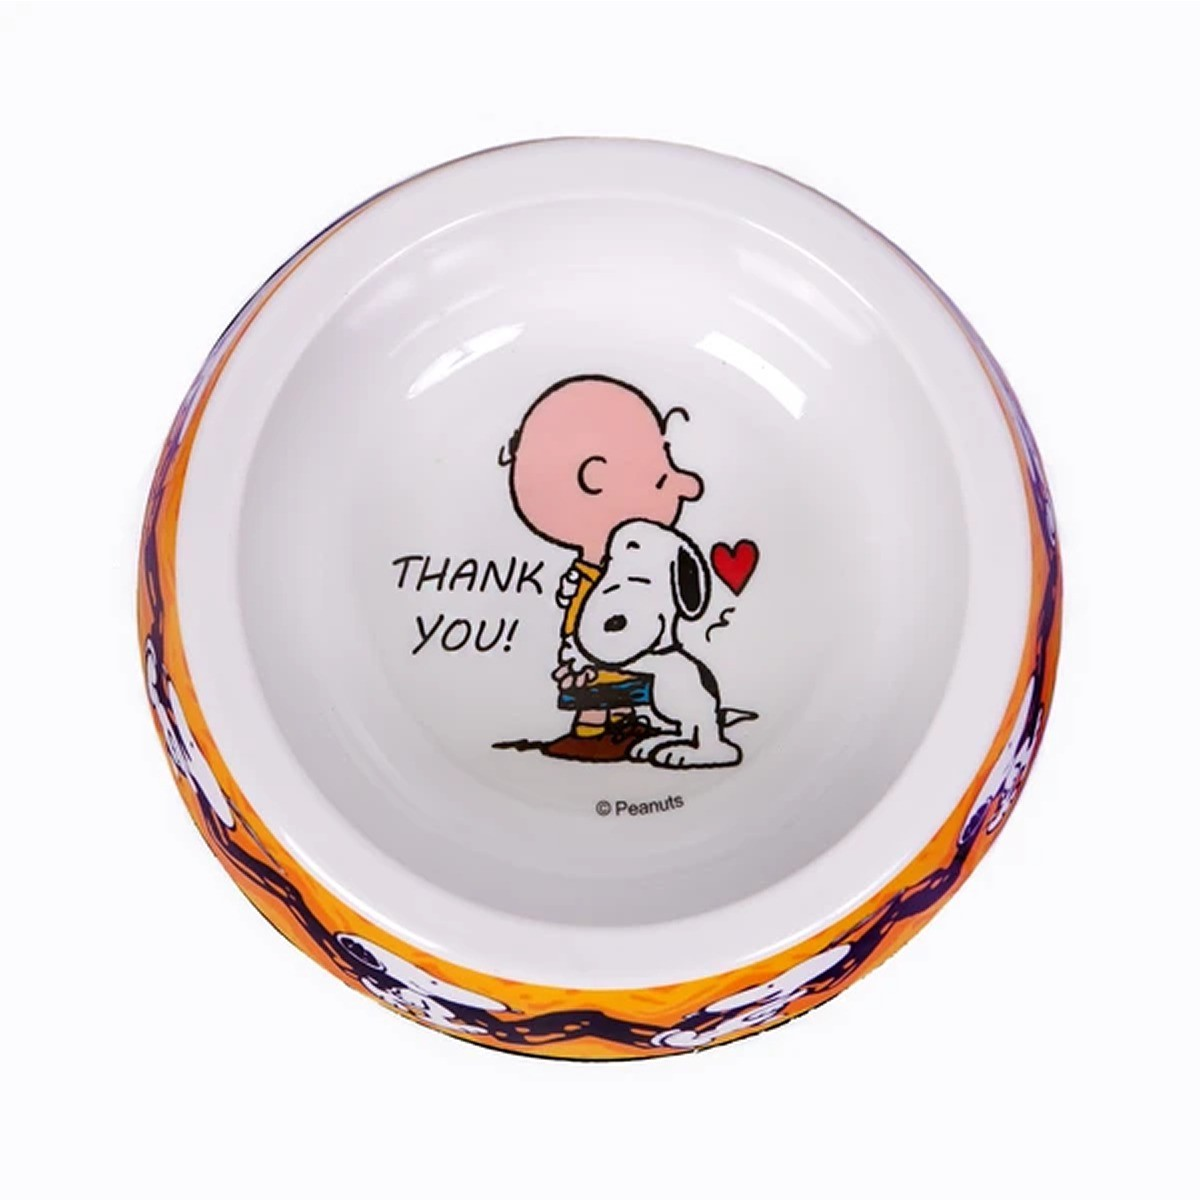 Comedouro para Cachorro Melanina Snoopy Charlie Brown Zooz Pets